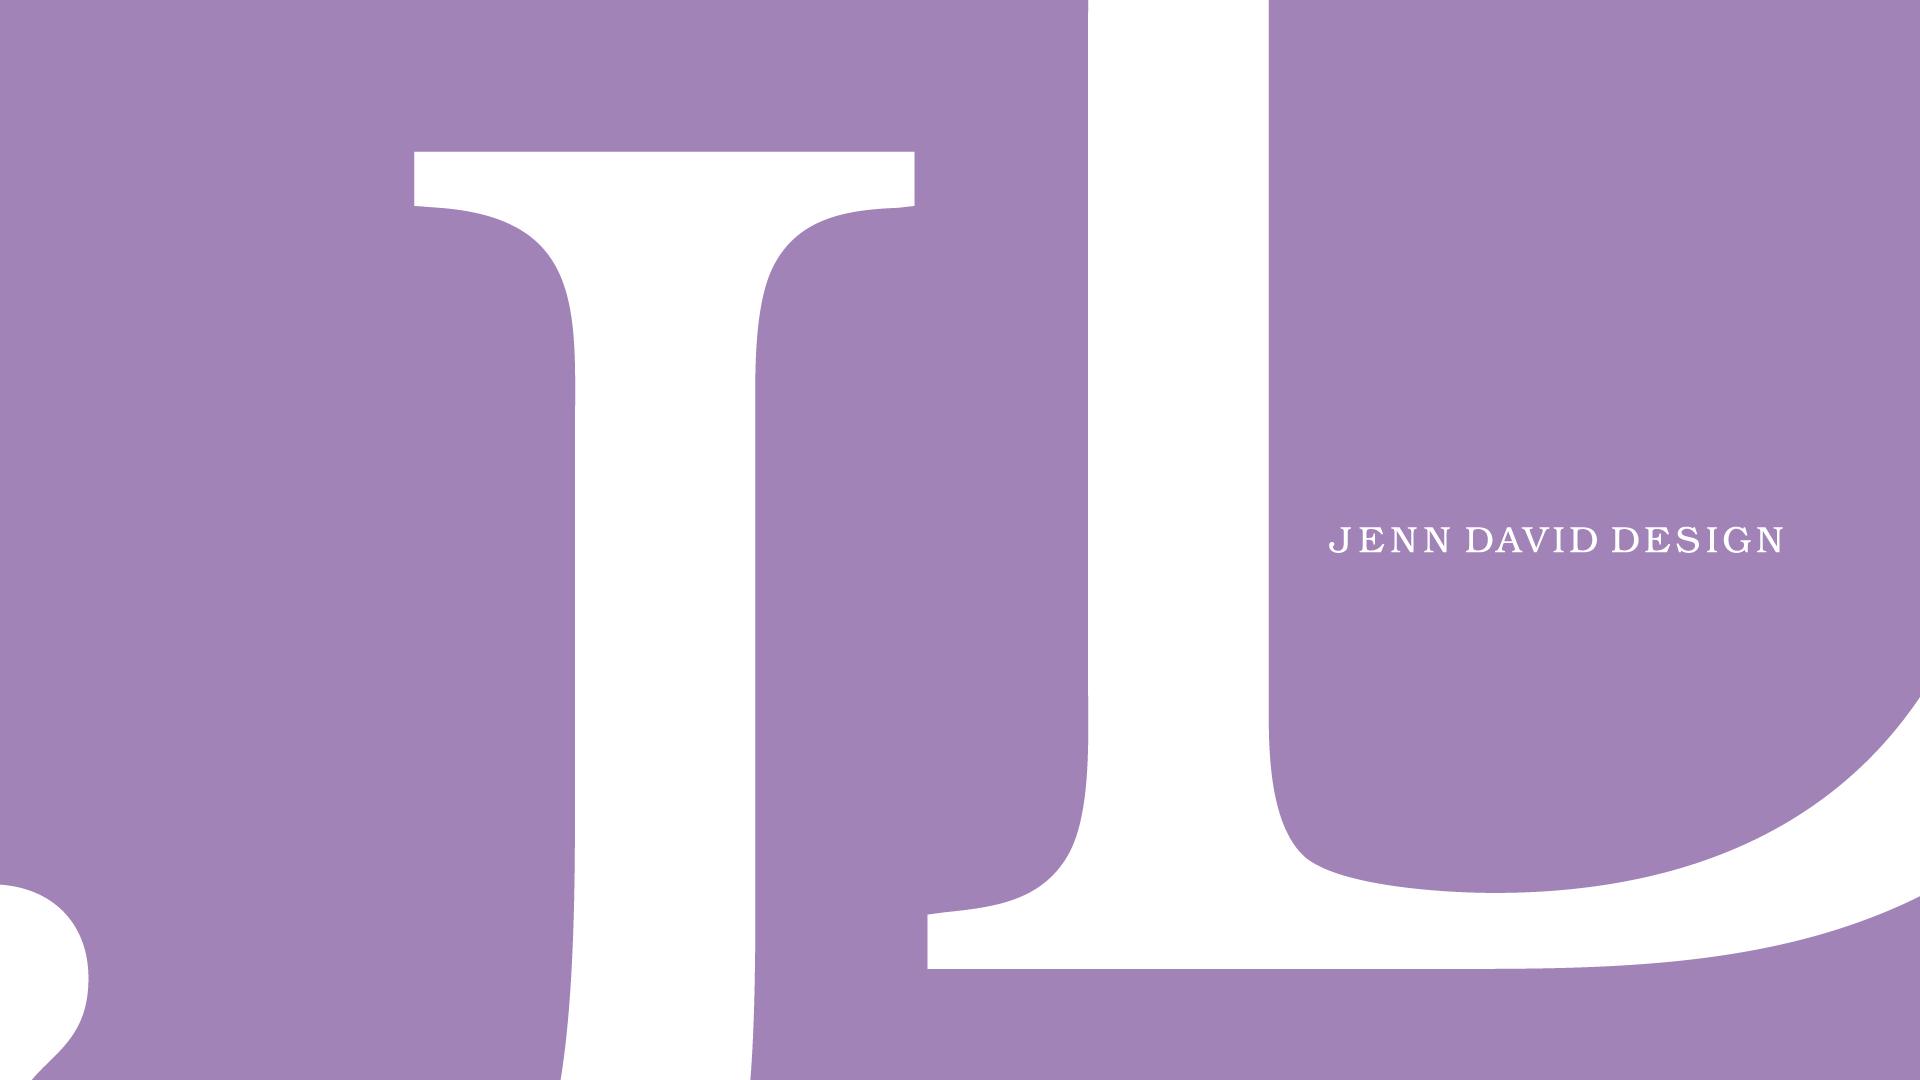 JennDavid-Edit04.Still001.png